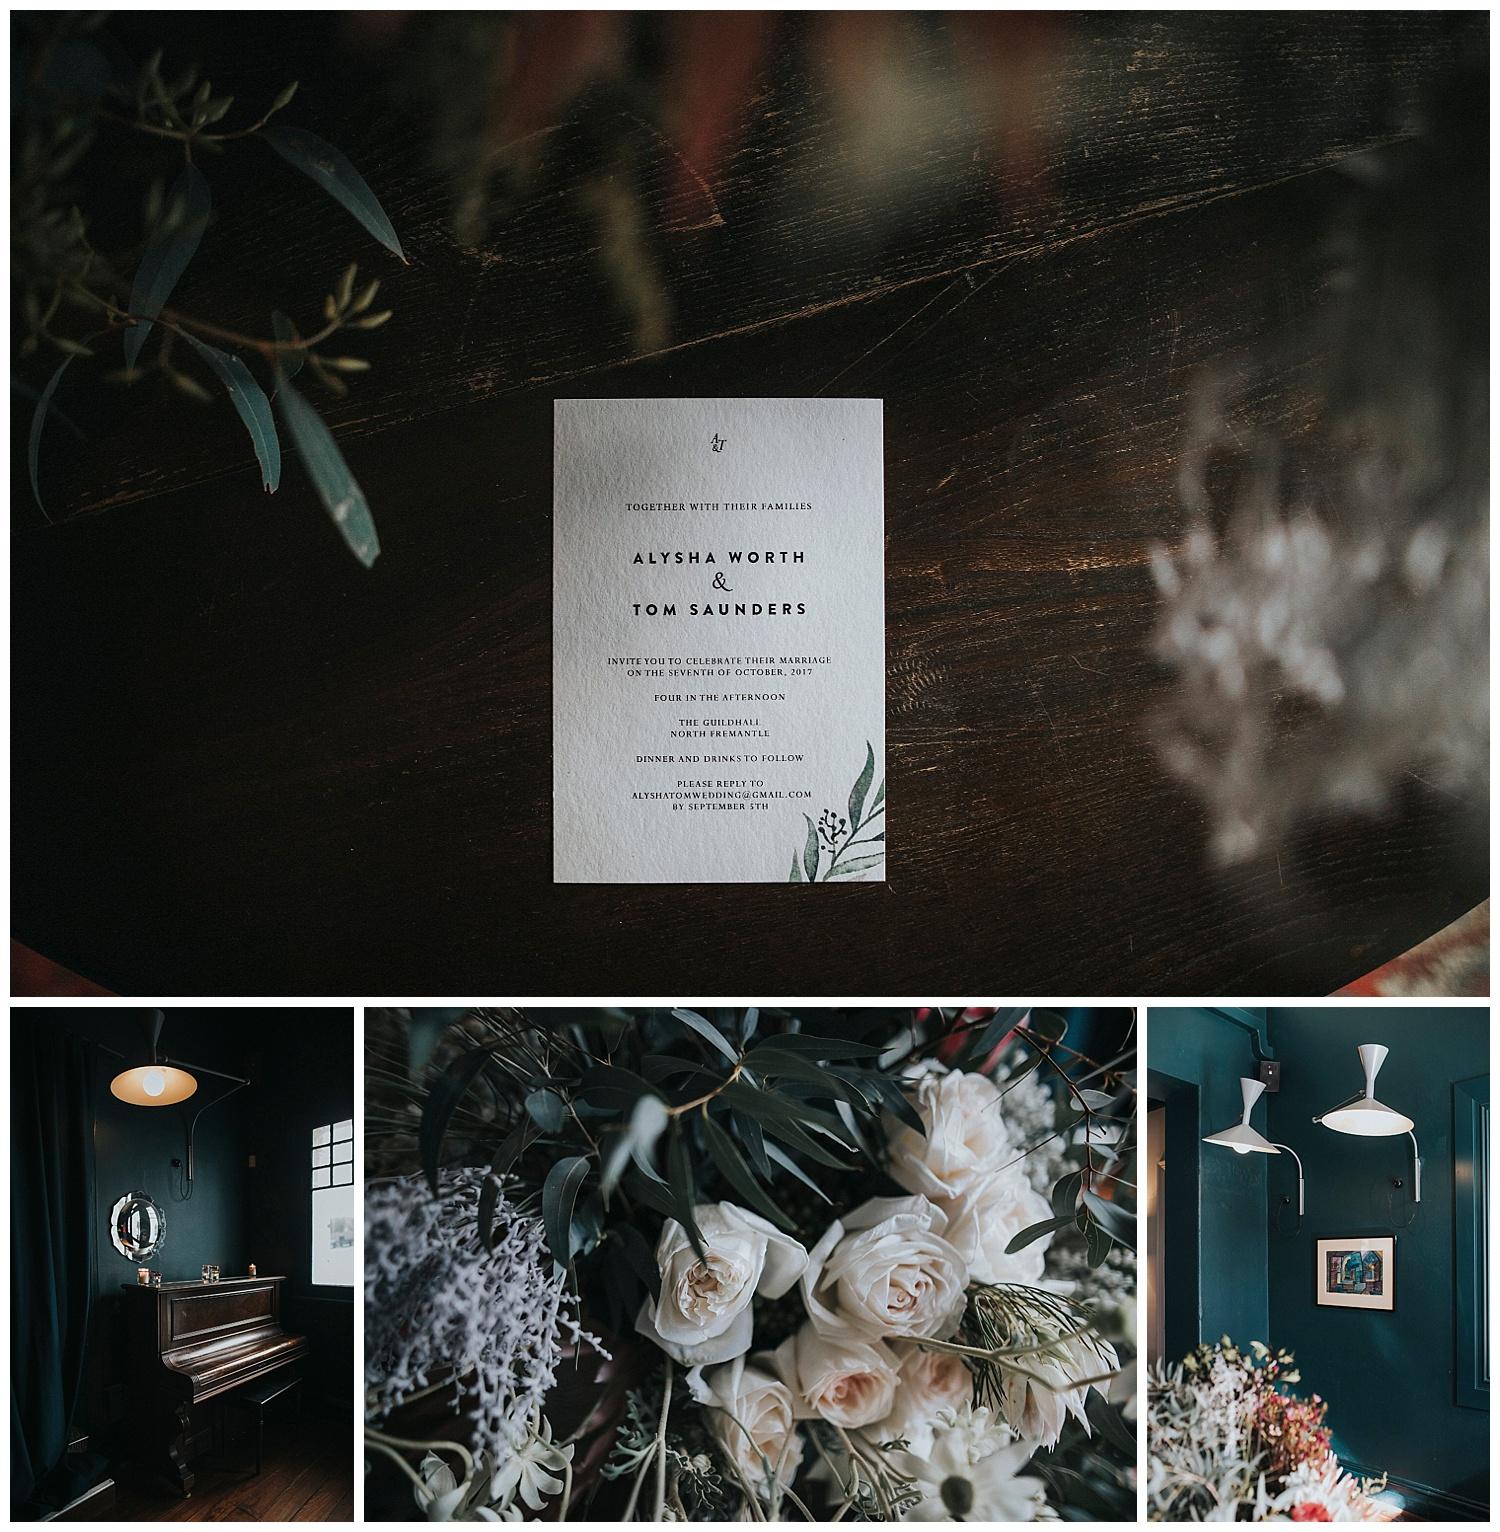 guildhall_wedding_keeper_creative_01.JPG